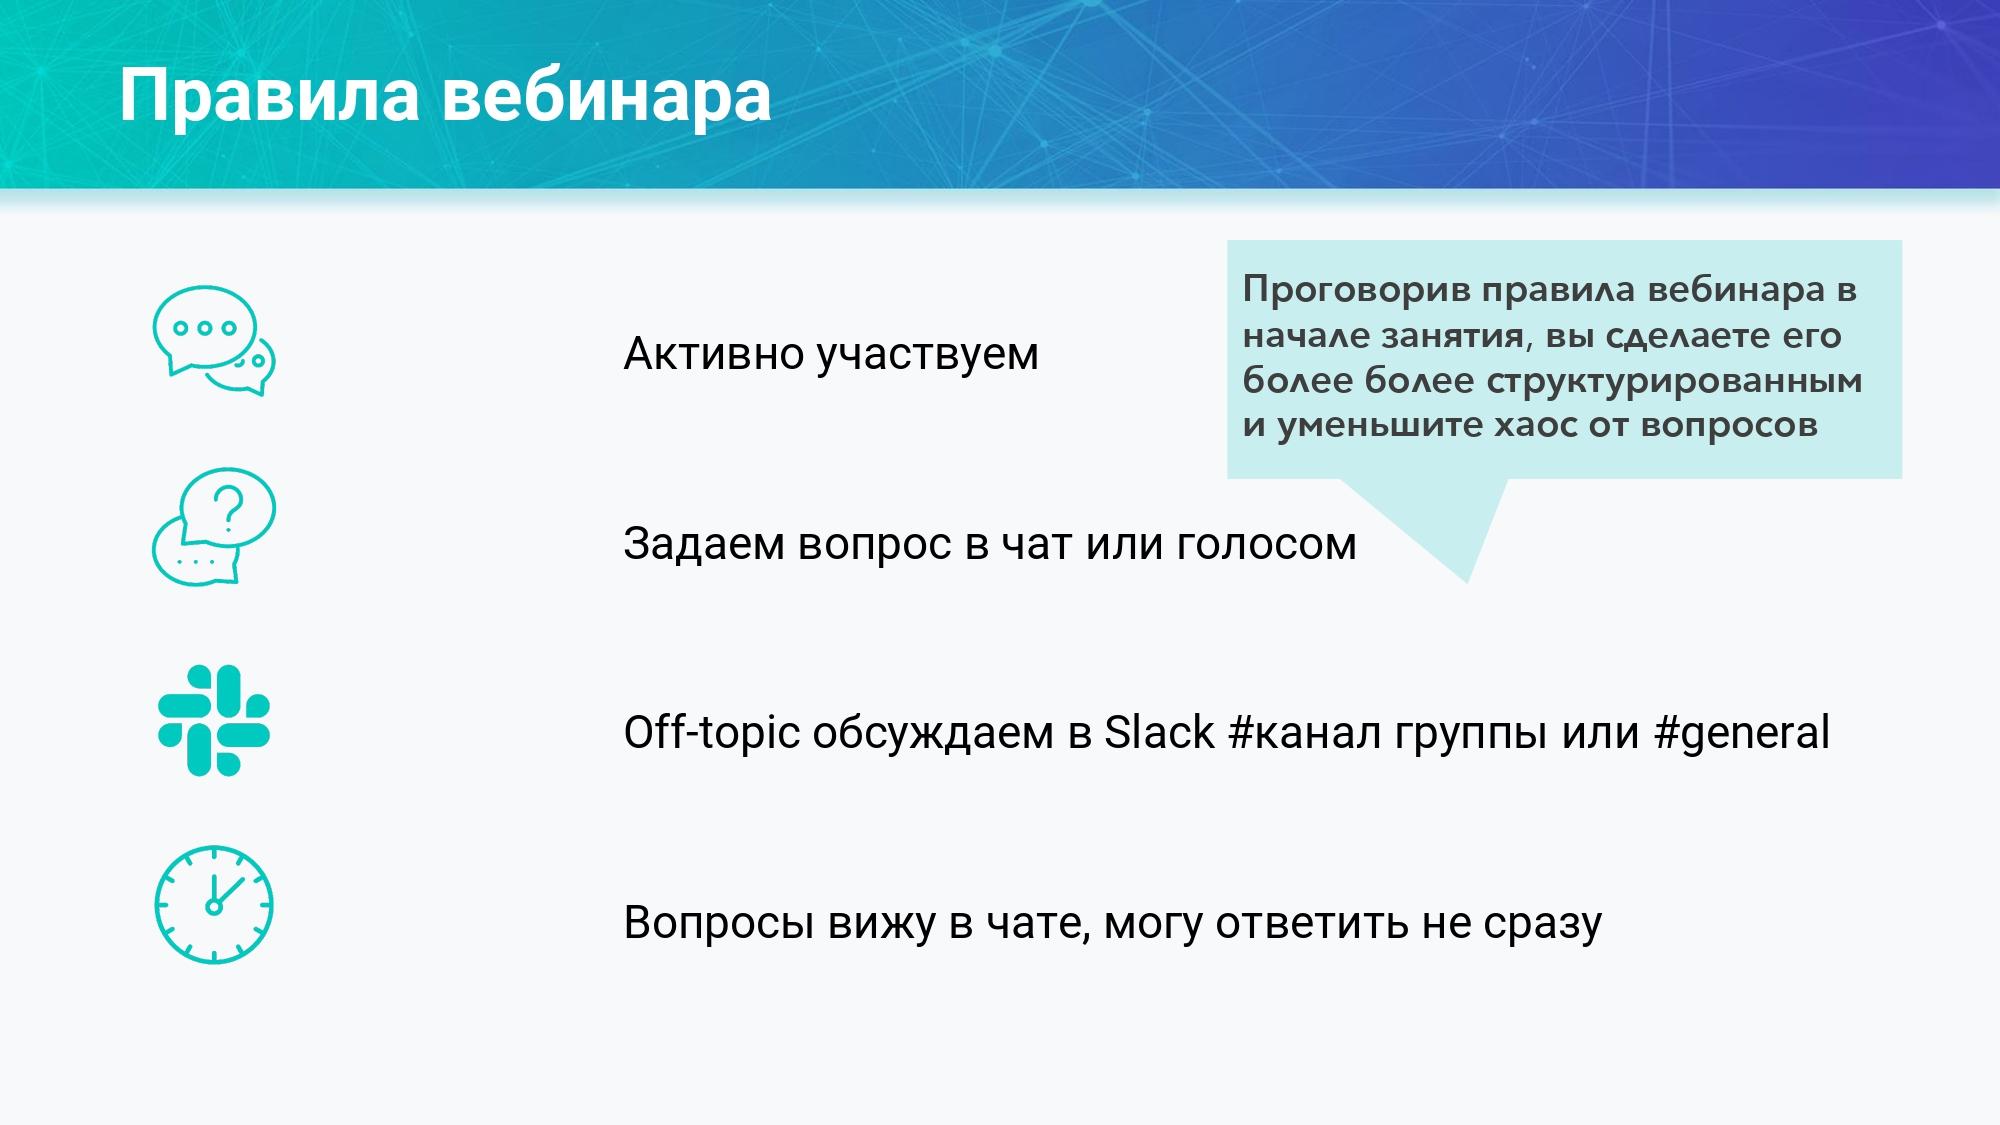 Шаблон_презентации_вебинара_в_новом_дизайне_с_подсказками_page_0005-73510-96287d.jpg